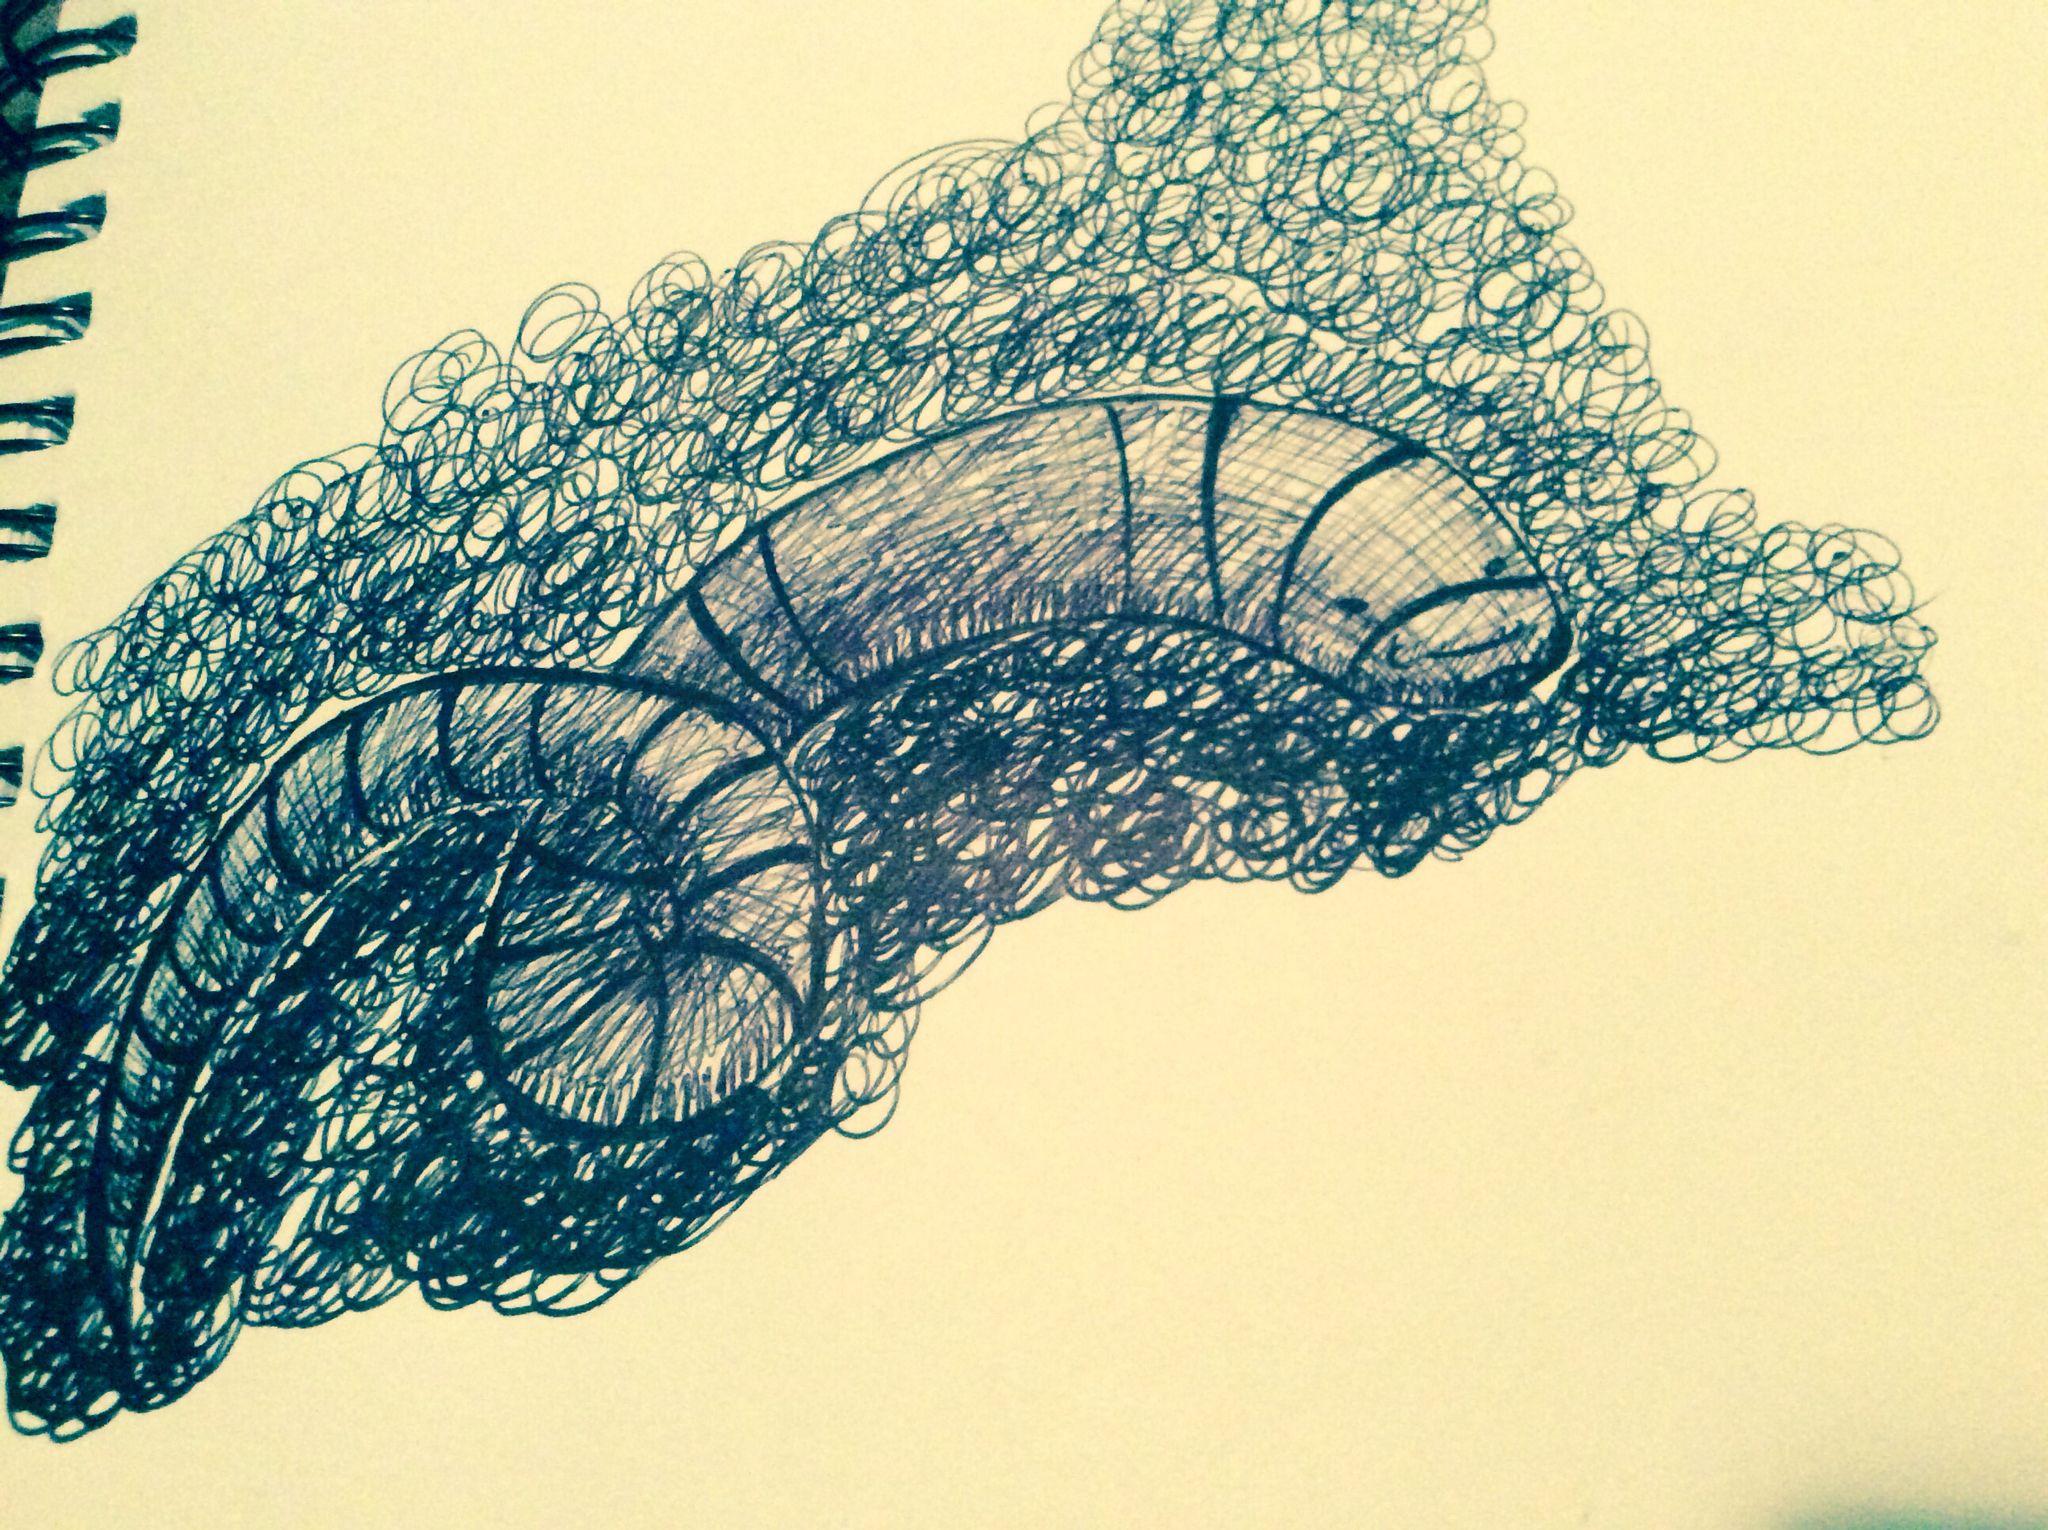 The Line Art Challenge Sketches For Days : Days drawing challenge time by kokorvesa on deviantart